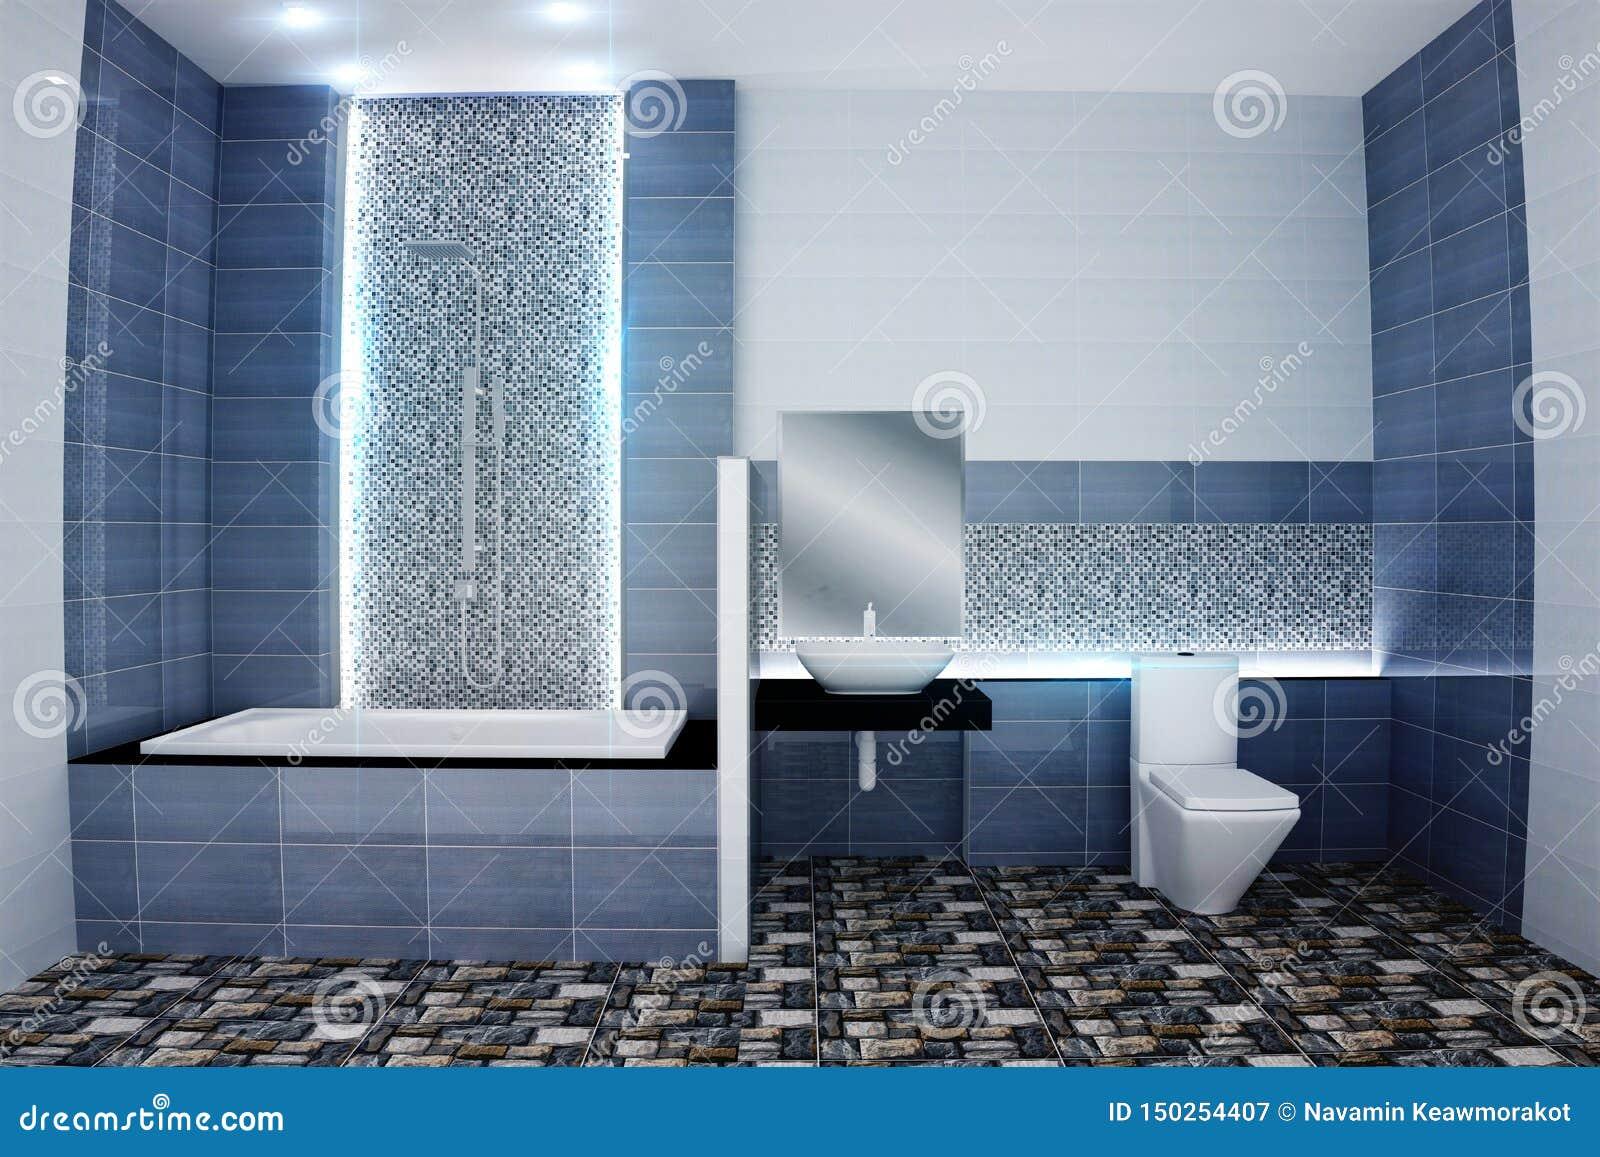 Bright Bathroom Design Tiles Blue Modern Style. 3D Rendering ...